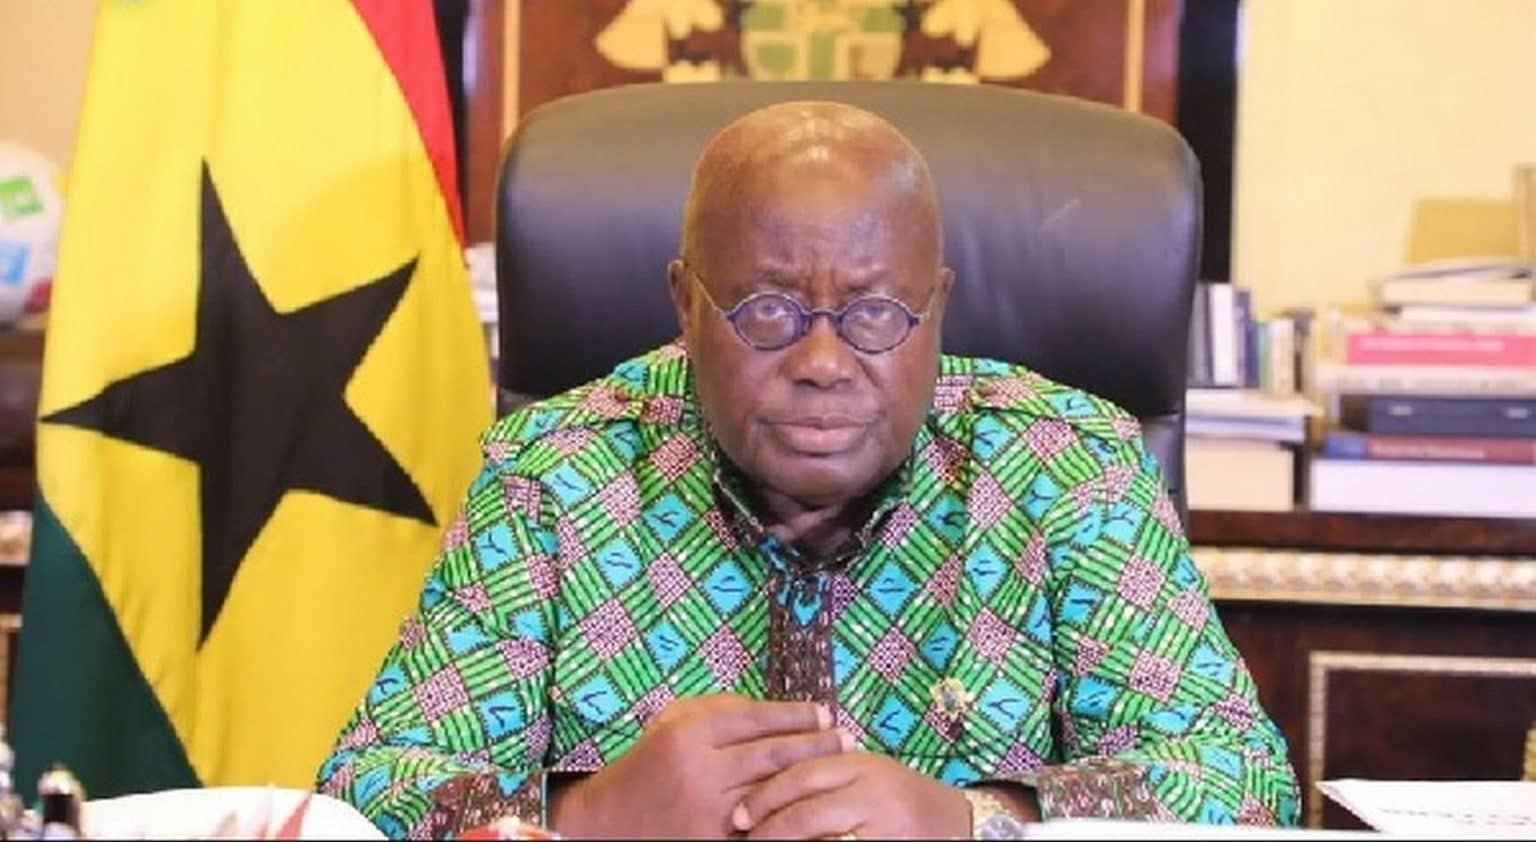 Ghanaian President, Nana Akufo-Addo